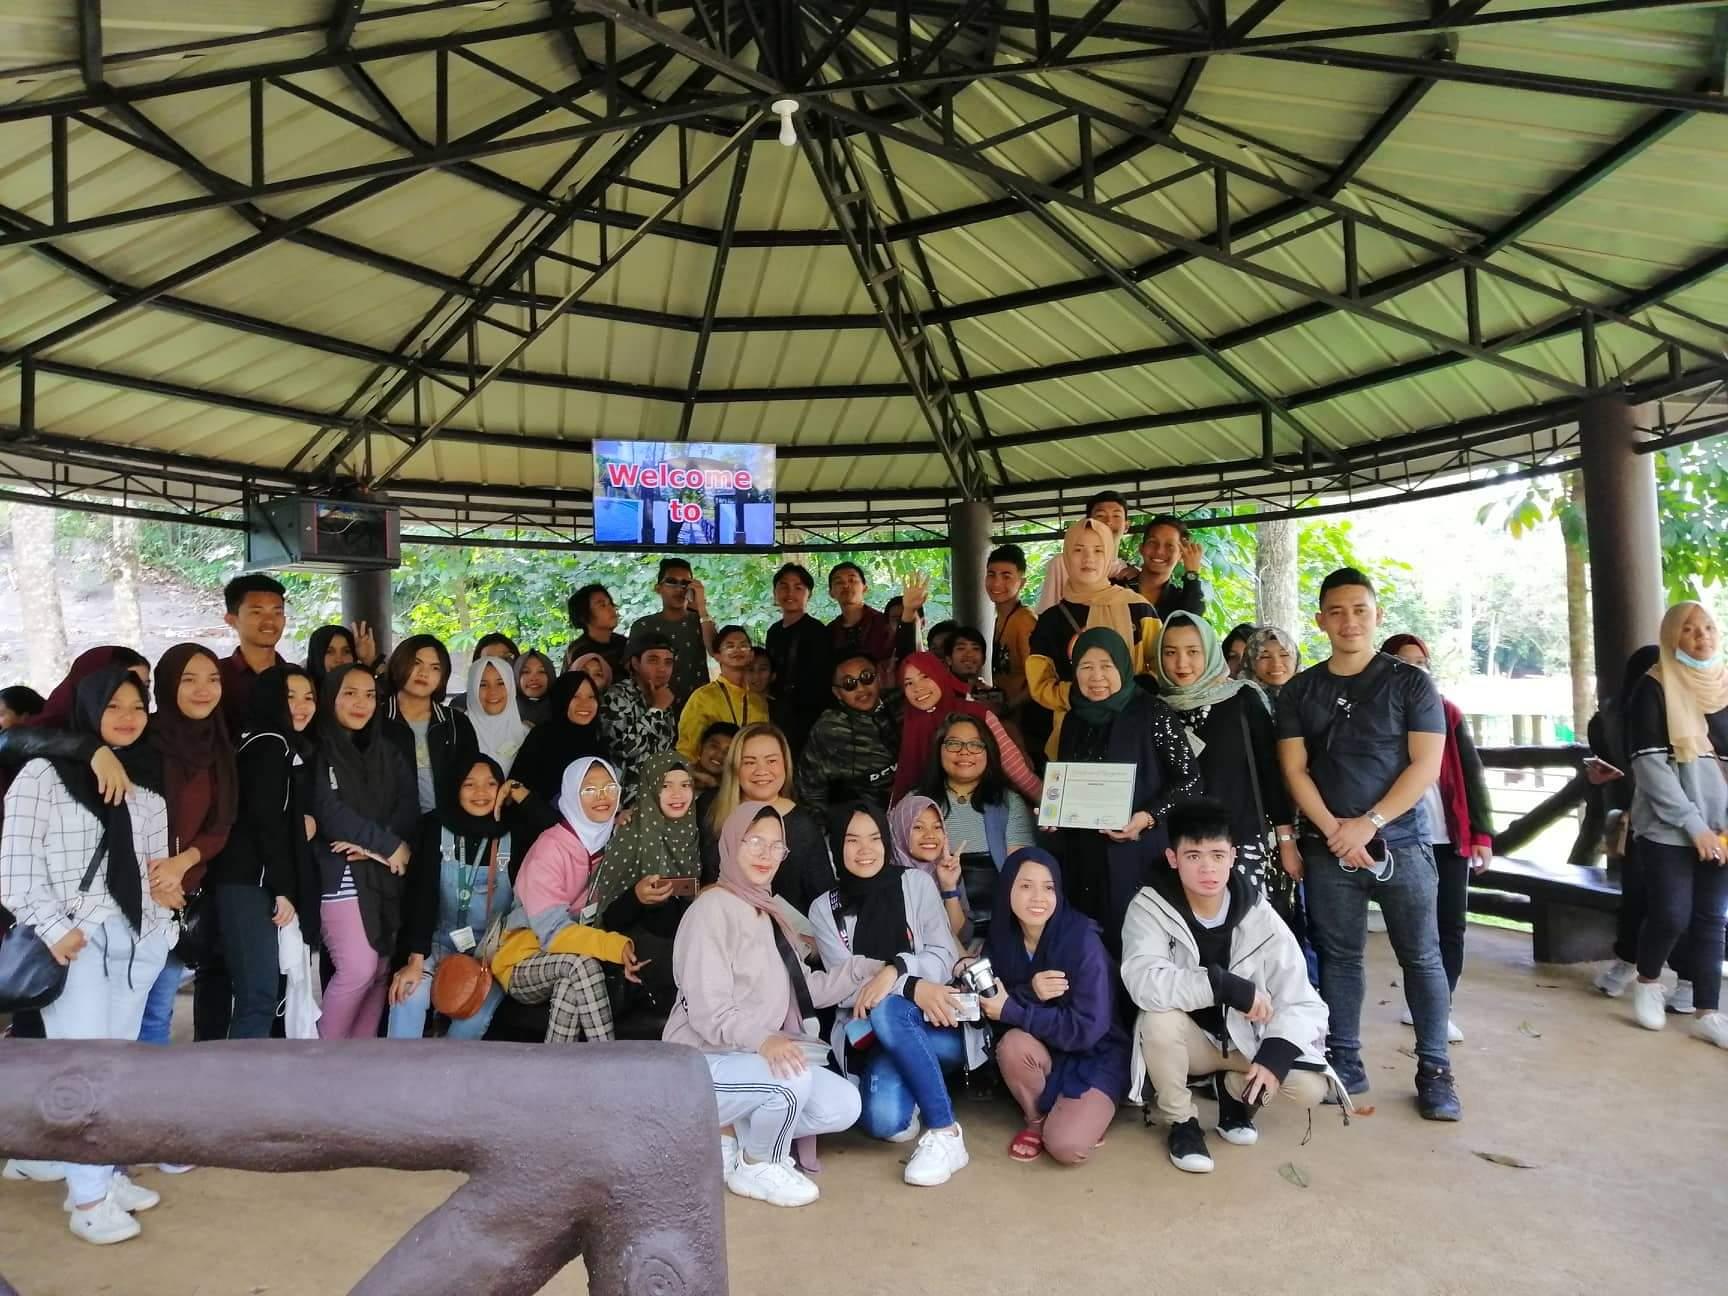 Spreading peace through social media (The day I spoke before Marawi kids)